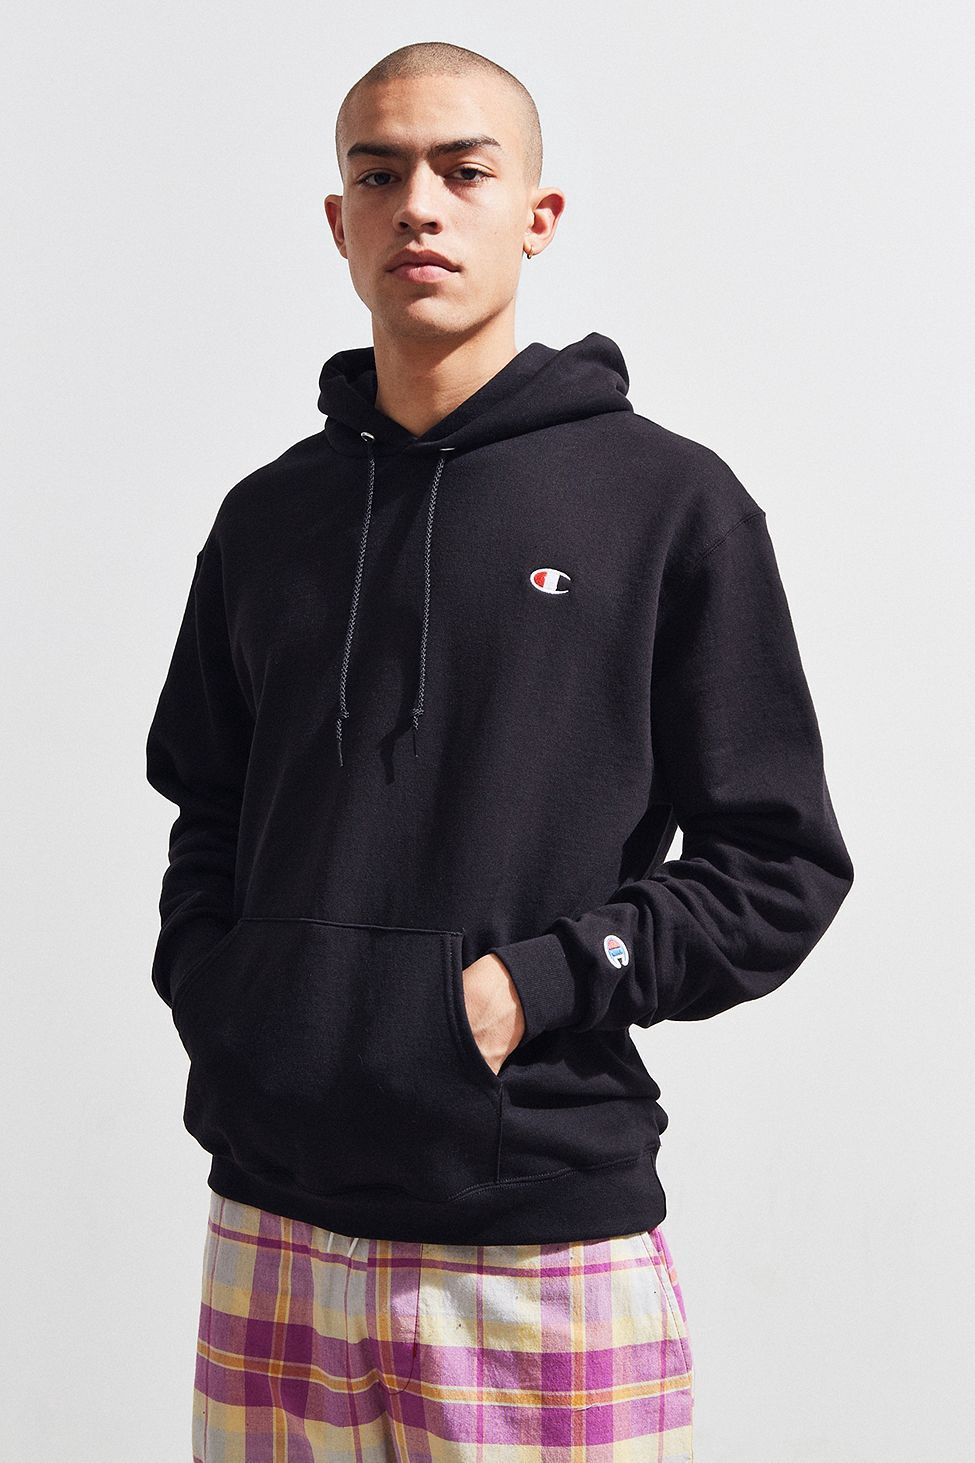 Urban Outfitters Champion Stacked Eco Hoodie Sweatshirt White Xl Sweatshirts Hoodie Hoodies Sweatshirts [ 1463 x 975 Pixel ]